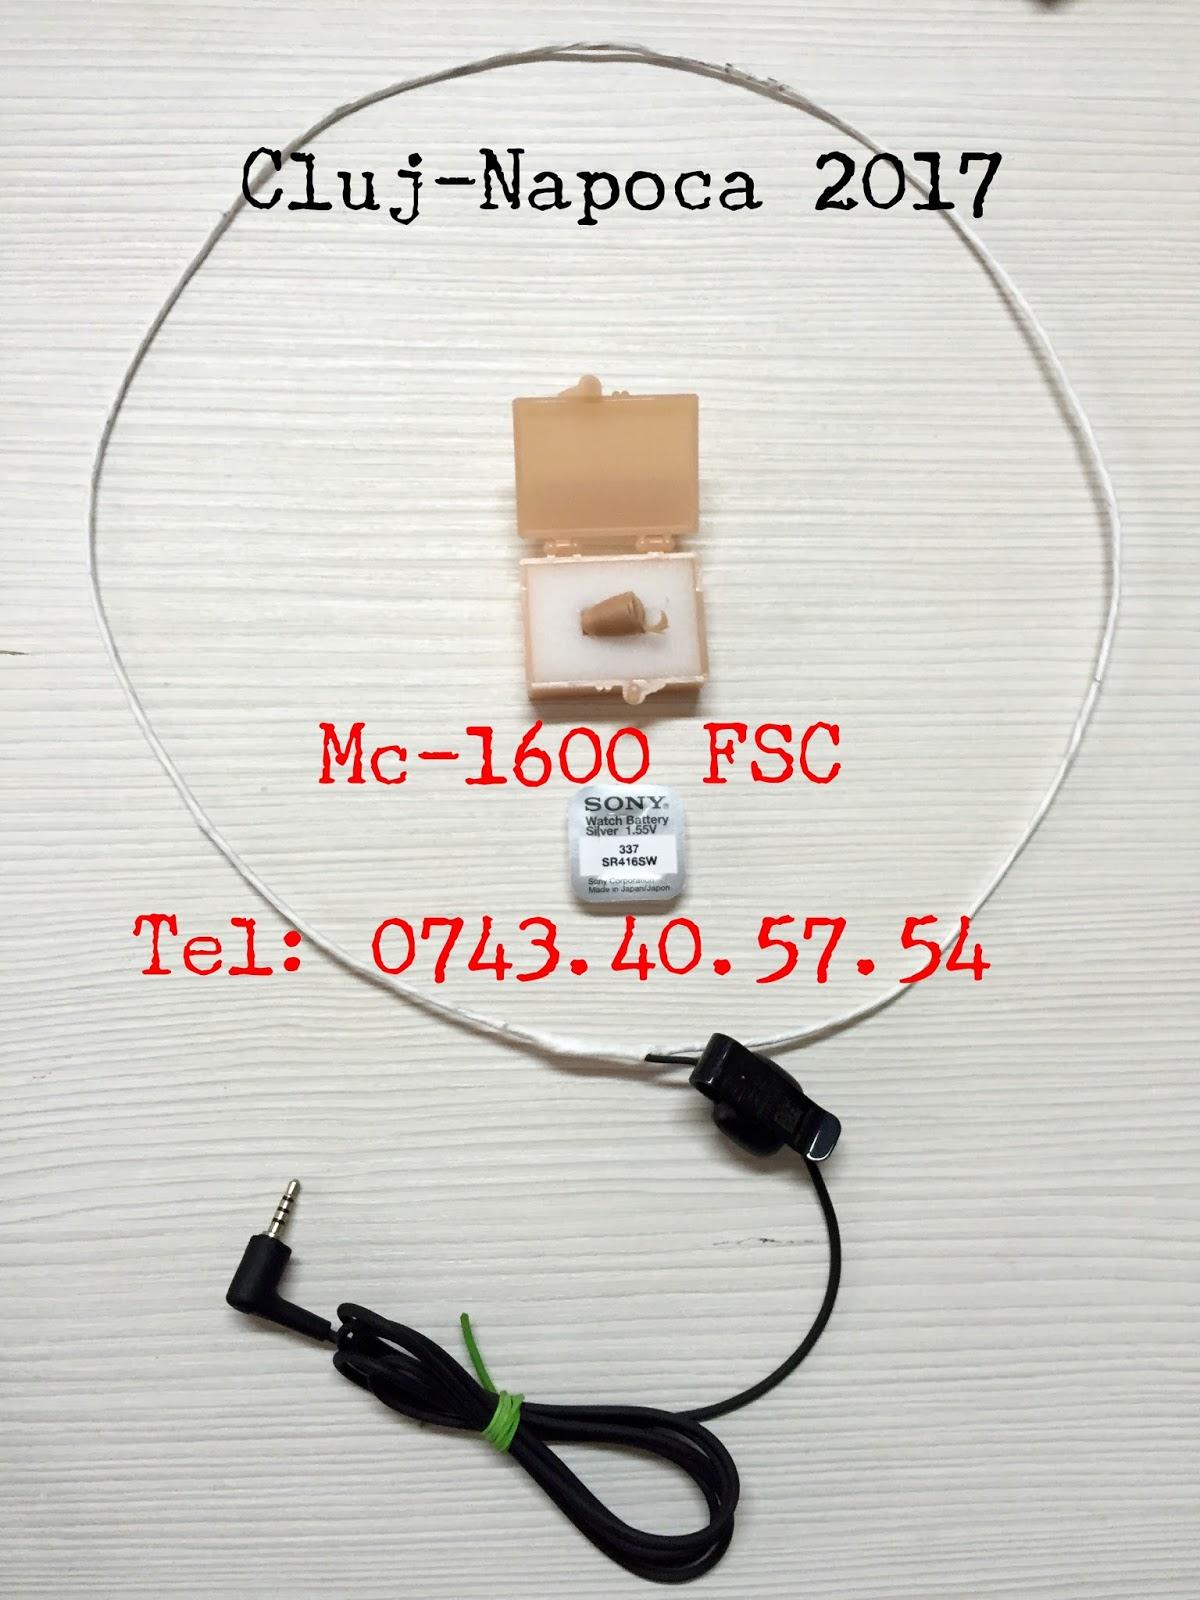 medium resolution of sistem colier casca japoneza motorola mc 1600 fsc mc 1700 fsc mc2000 actuala denumire nejustificata 1 baterie functioneaza la orice telefon sau